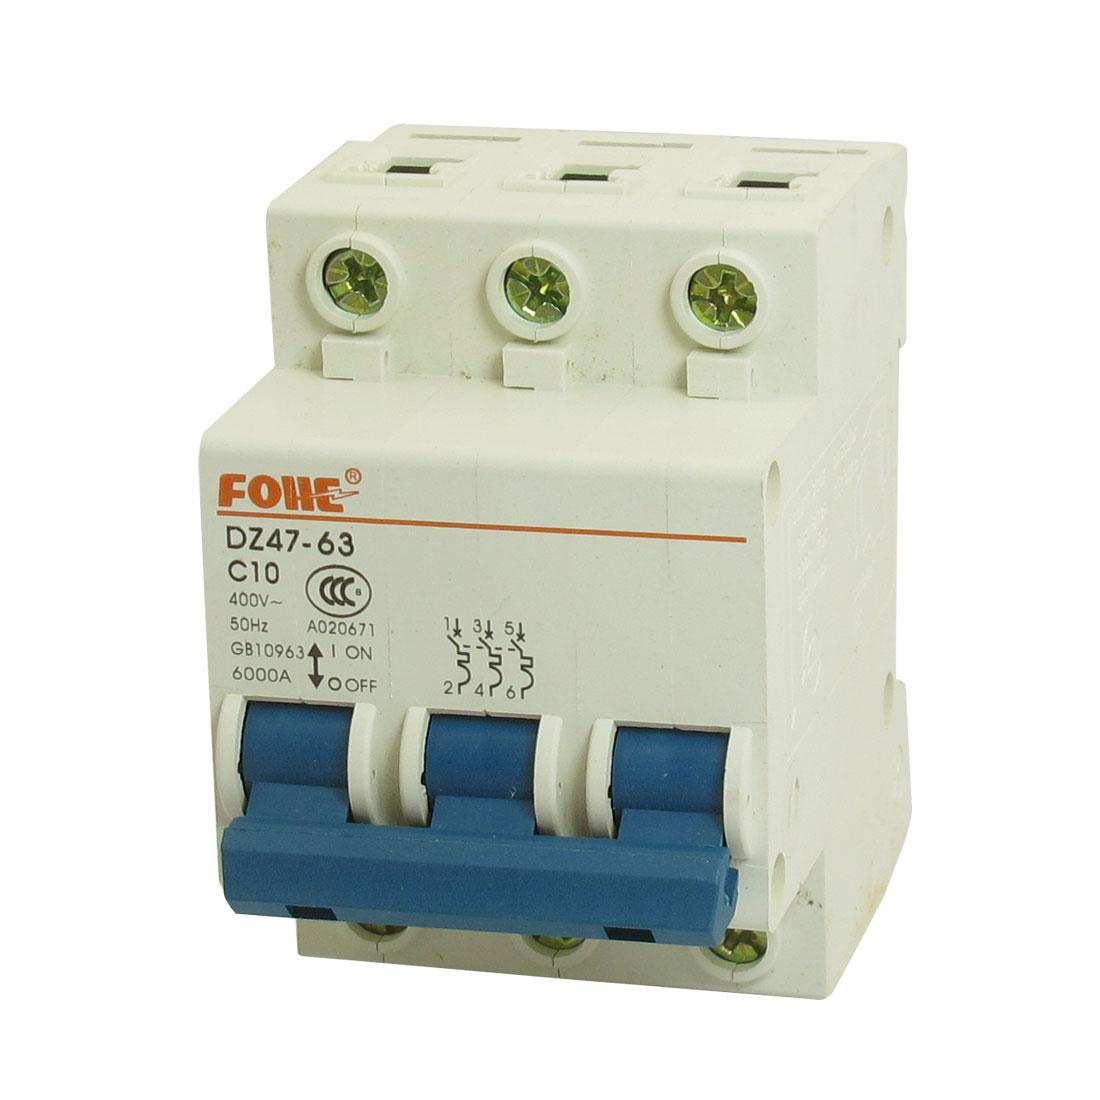 DZ47-63 C10 3P DIN Rail Mount MCB Miniature Circuit Breaker 6000A 10A 400V AC